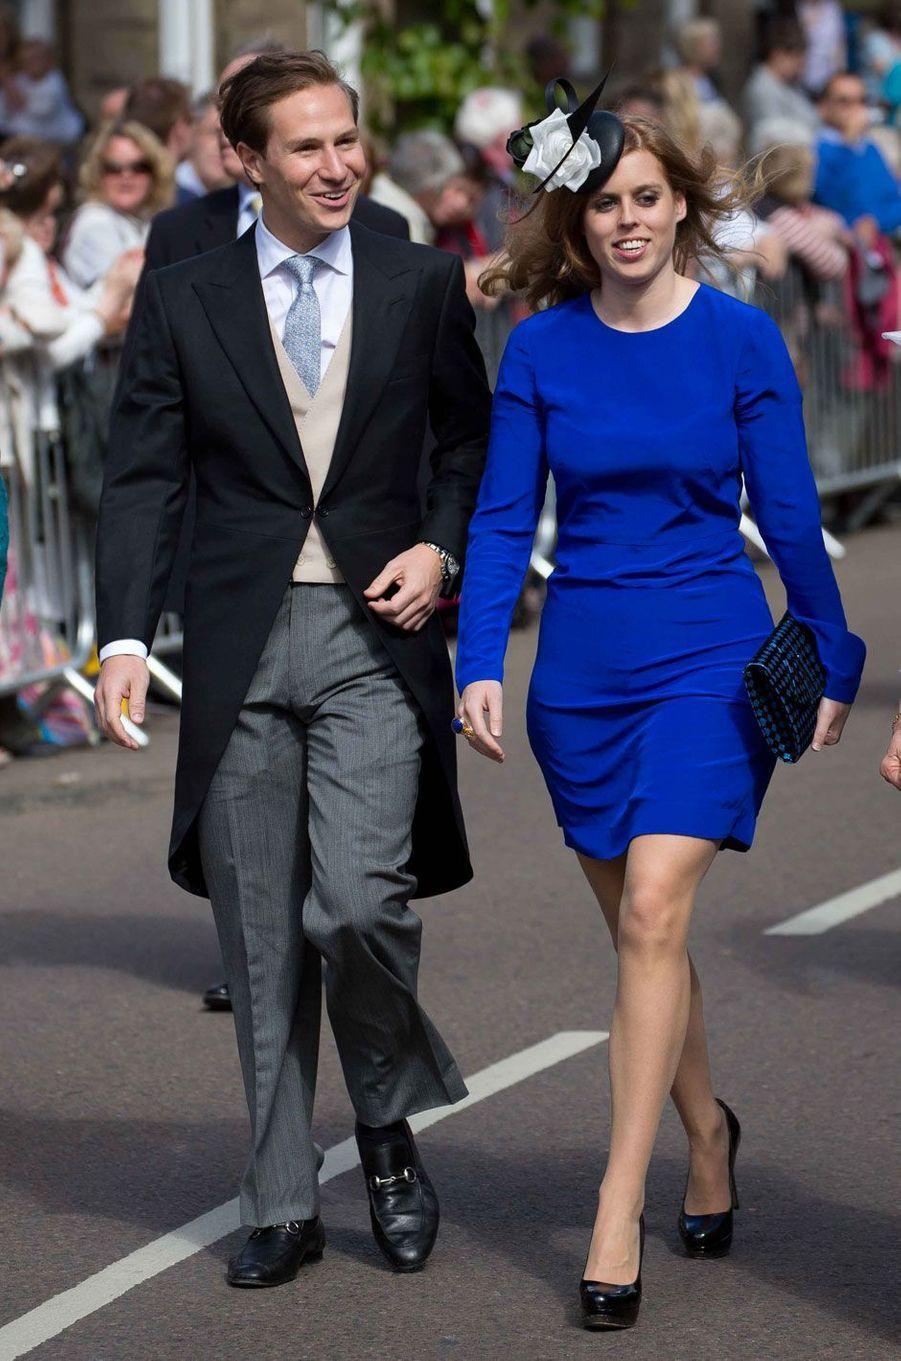 Le couple arrive au mariage deLady Melissa Percy et Thomas van Straubenzee, à Alnwick, en 2013